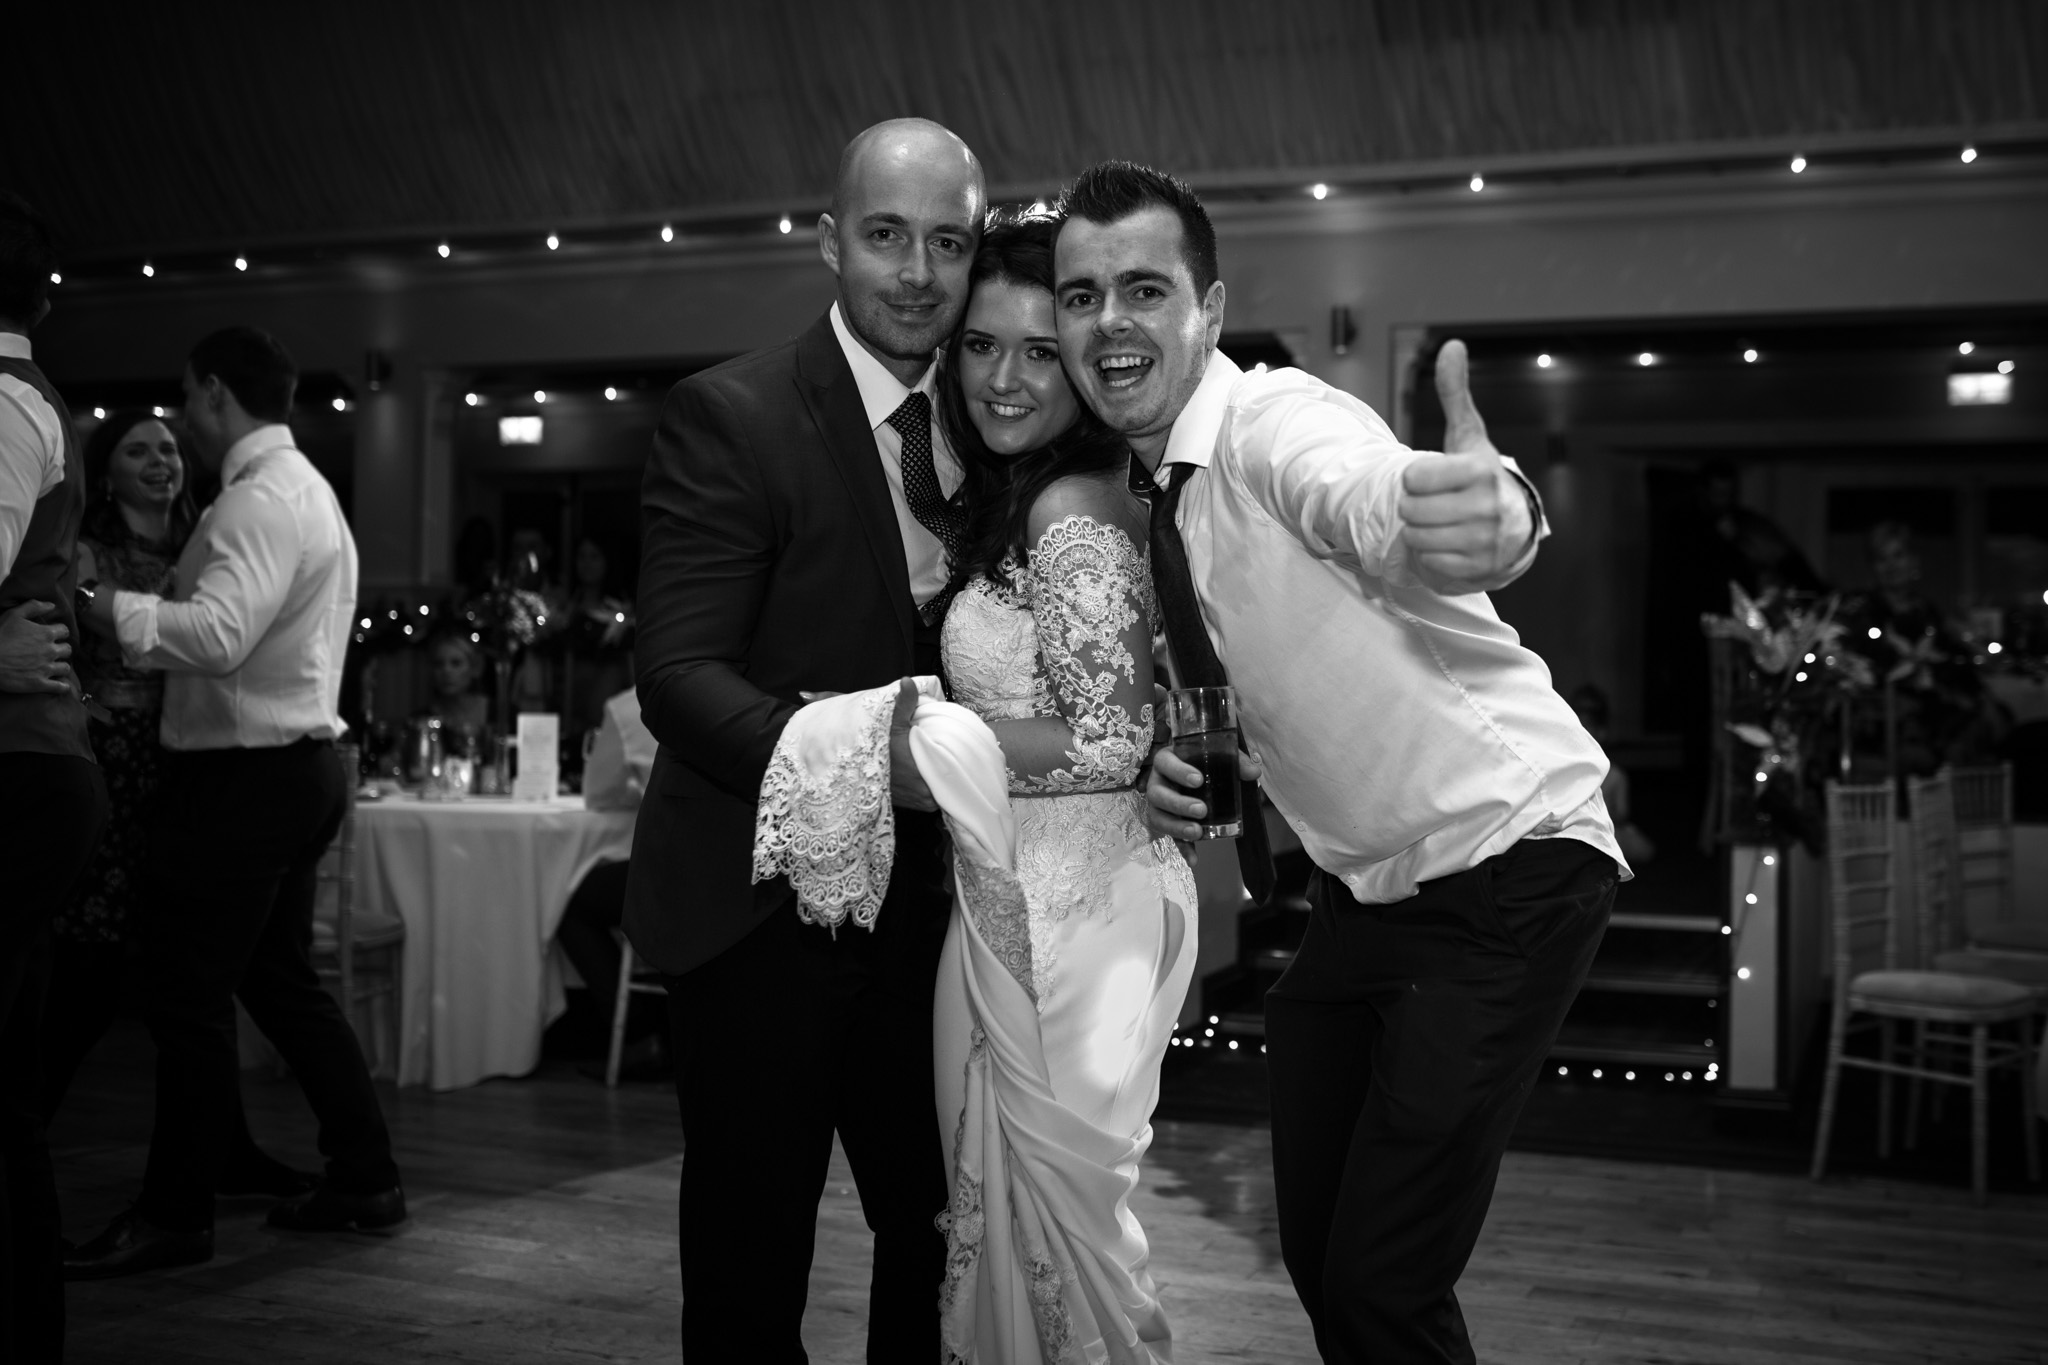 Mark_Barnes_Northern_Ireland_wedding_photographer_Harveys_Point_Donegall_Wedding_photography-Adam&Gemma-64.jpg